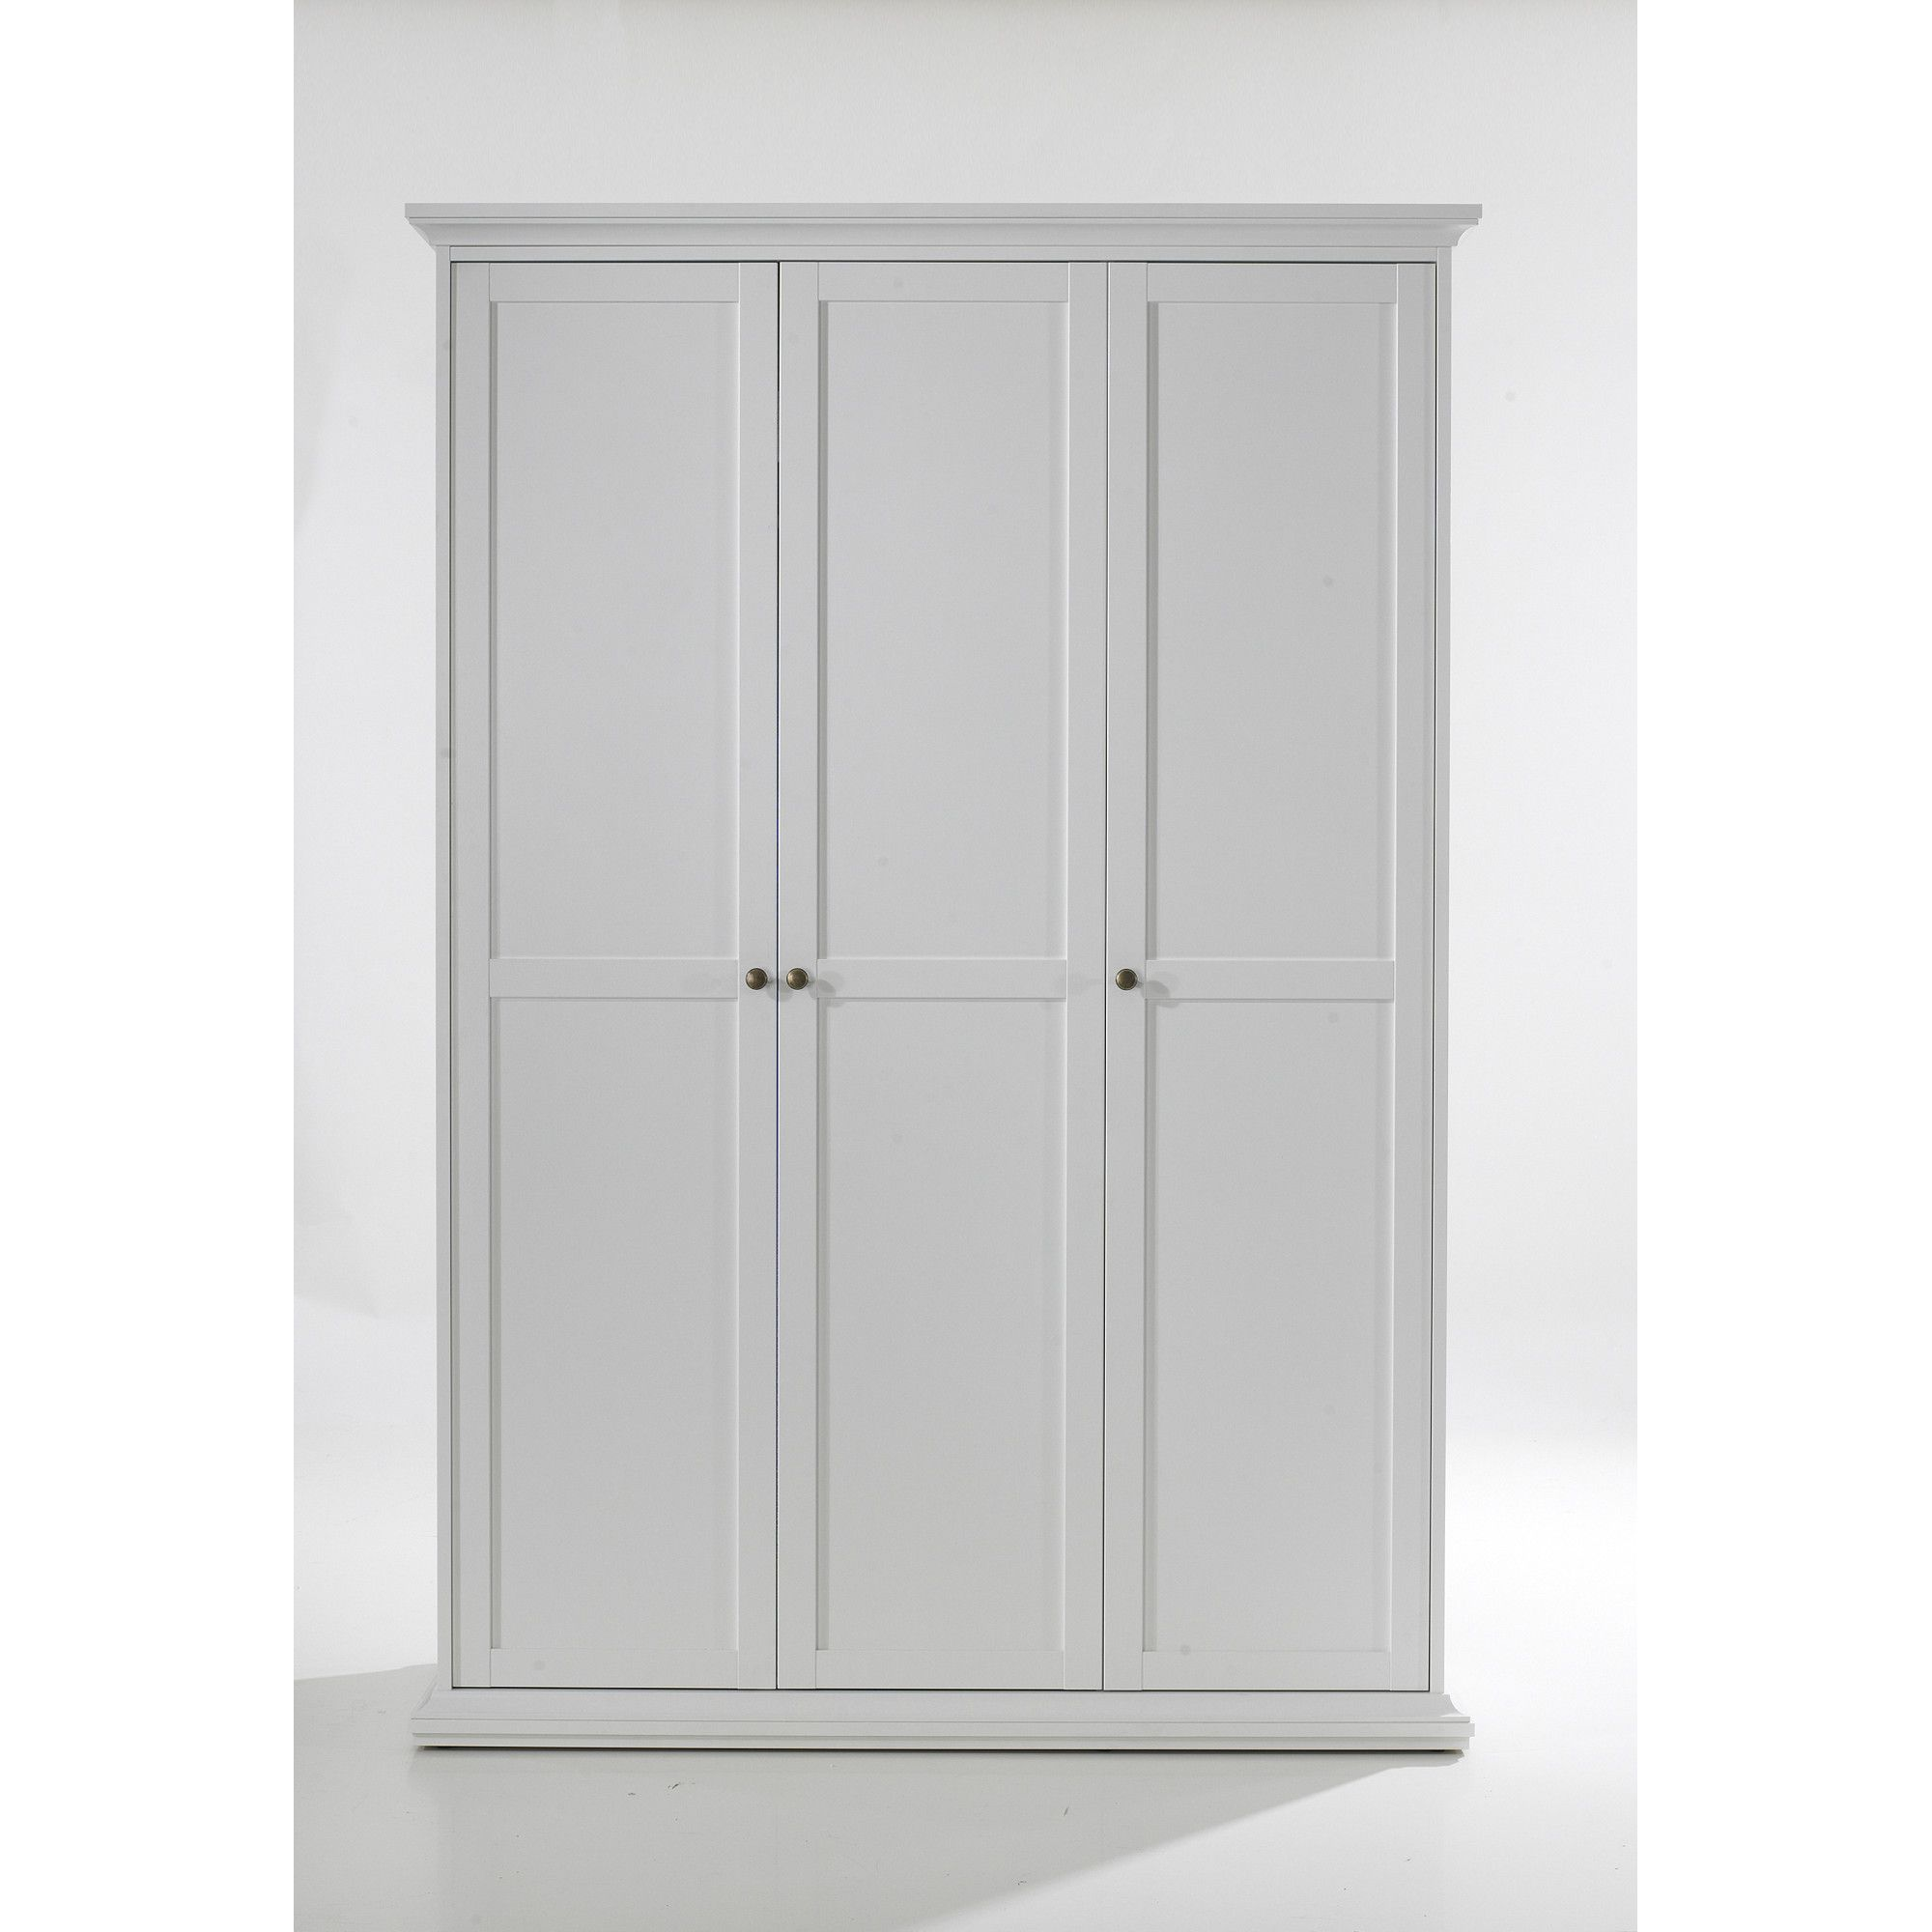 Tvilum Paris Three Door Wardrobe in White at Tesco Direct